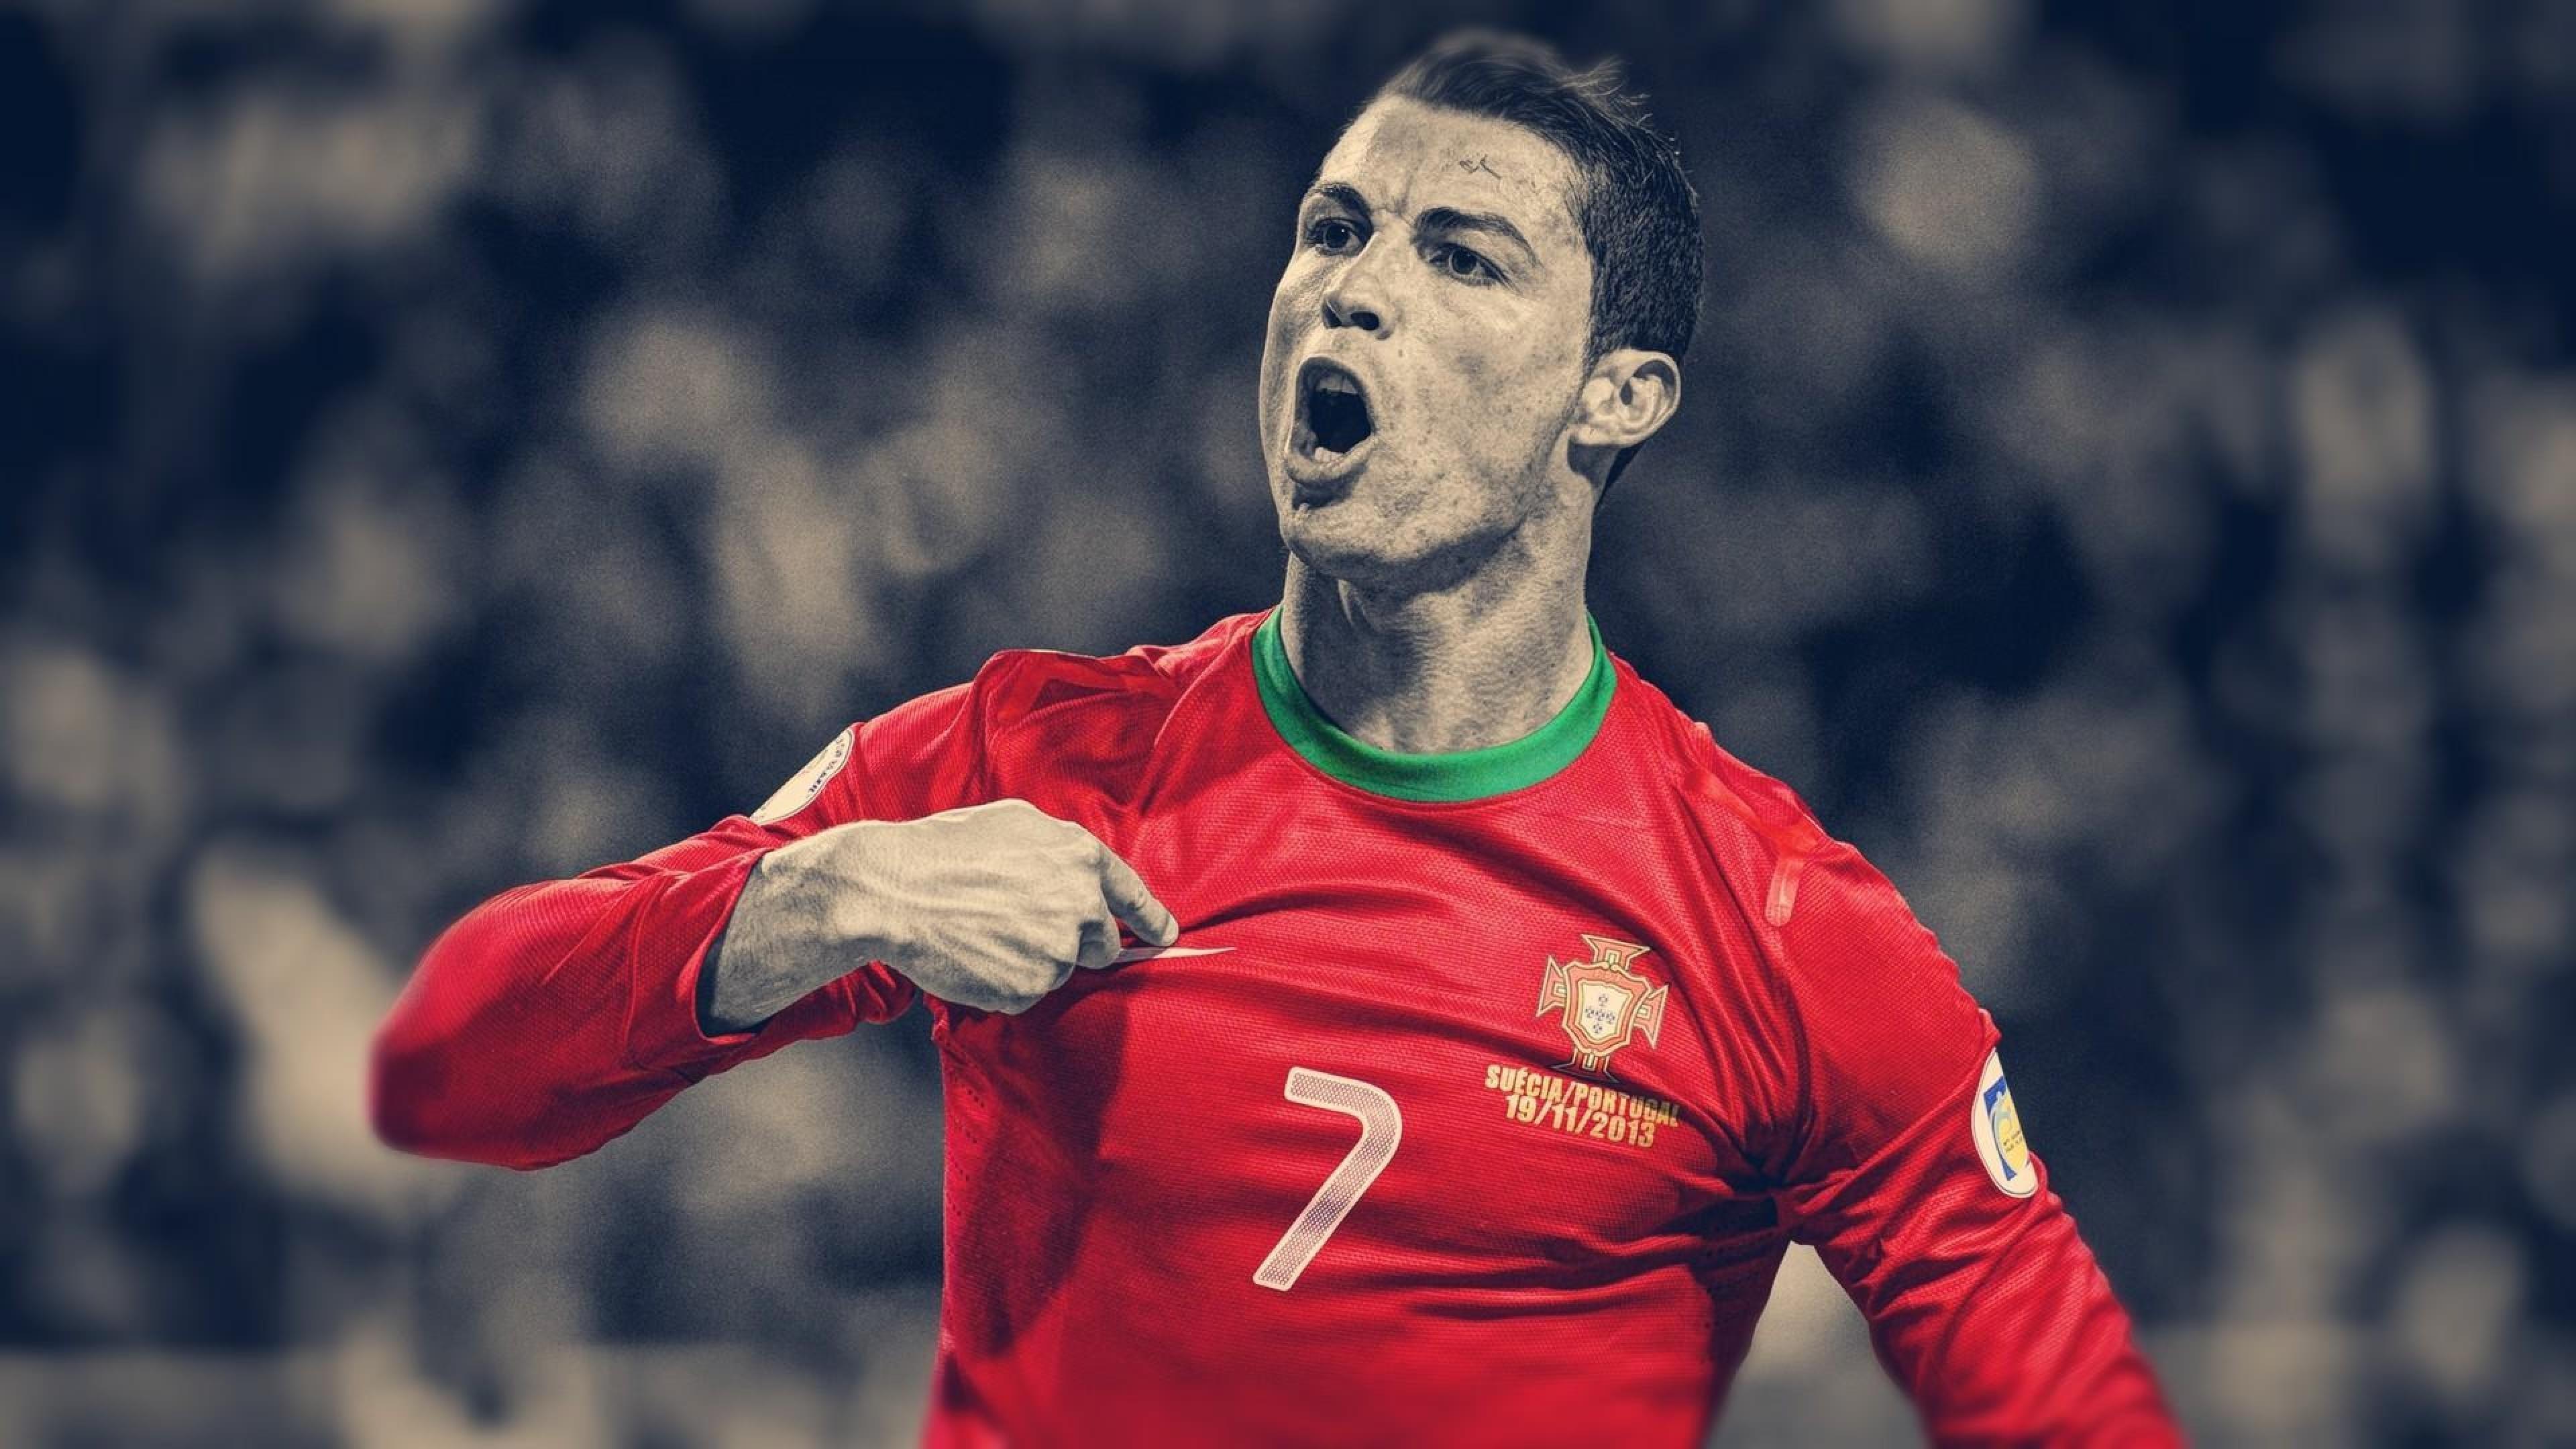 Football Hd Wallpapers P Hd Football Wallpapers P Cristiano Ronaldo Free Kick Ronaldo Free Kick Cristiano Ronaldo